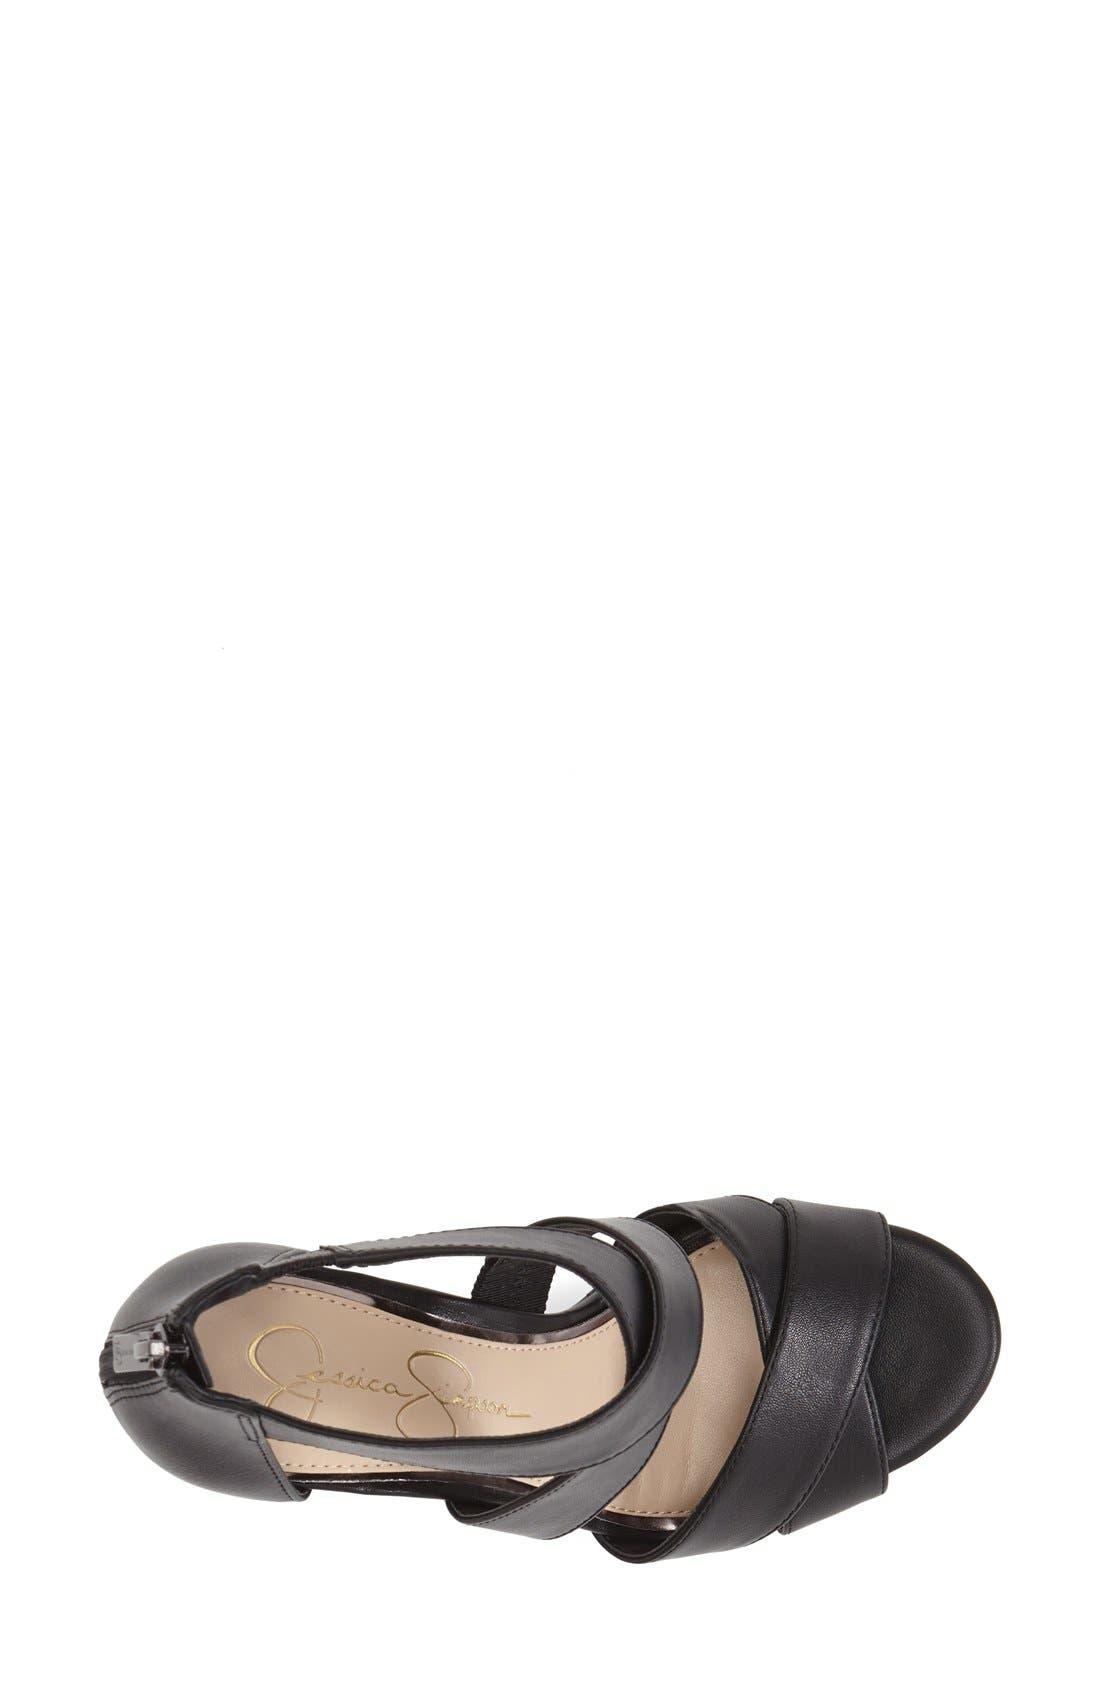 'Jadyn' Strappy Wedge Sandal,                             Alternate thumbnail 2, color,                             001